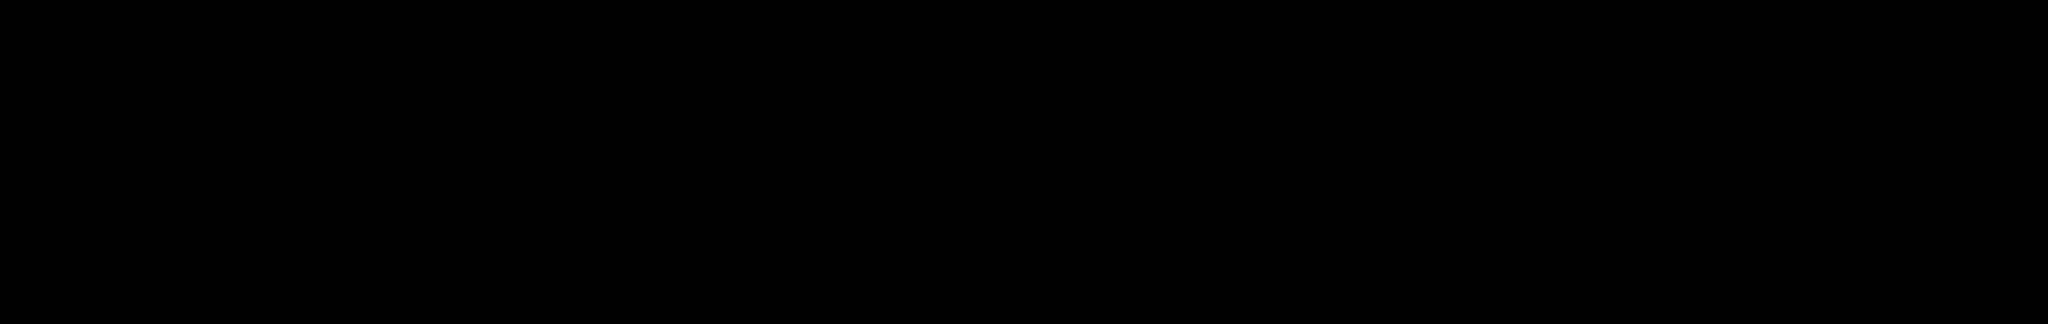 v-kool_logo_1